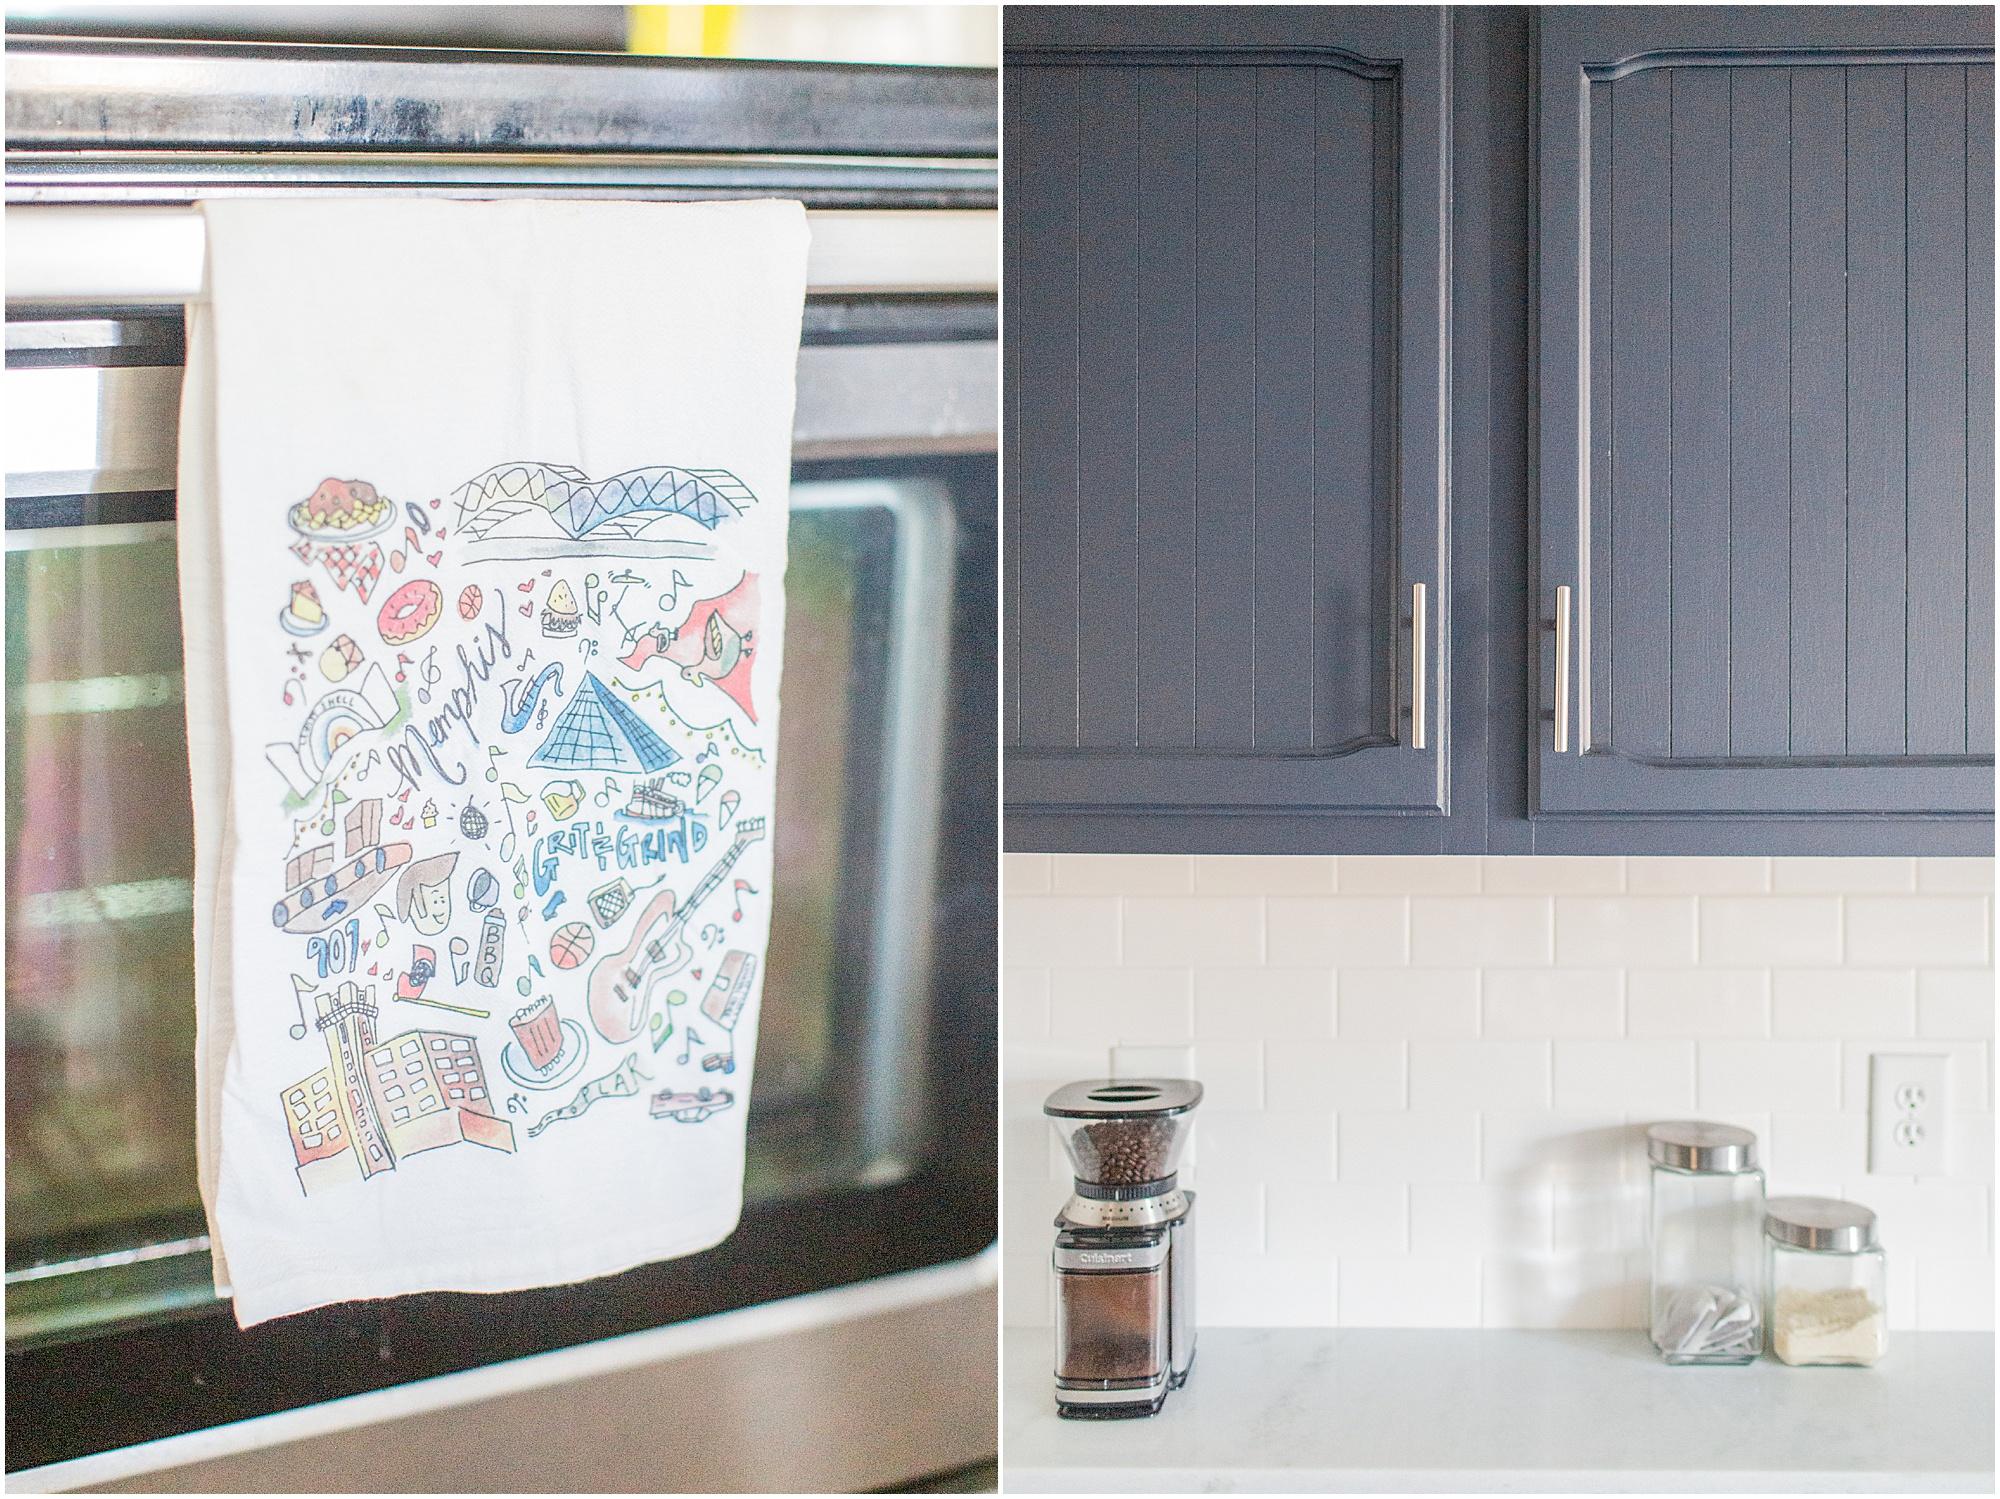 hambick-house-kitchen-renovation-fixer-upper_0020.jpg